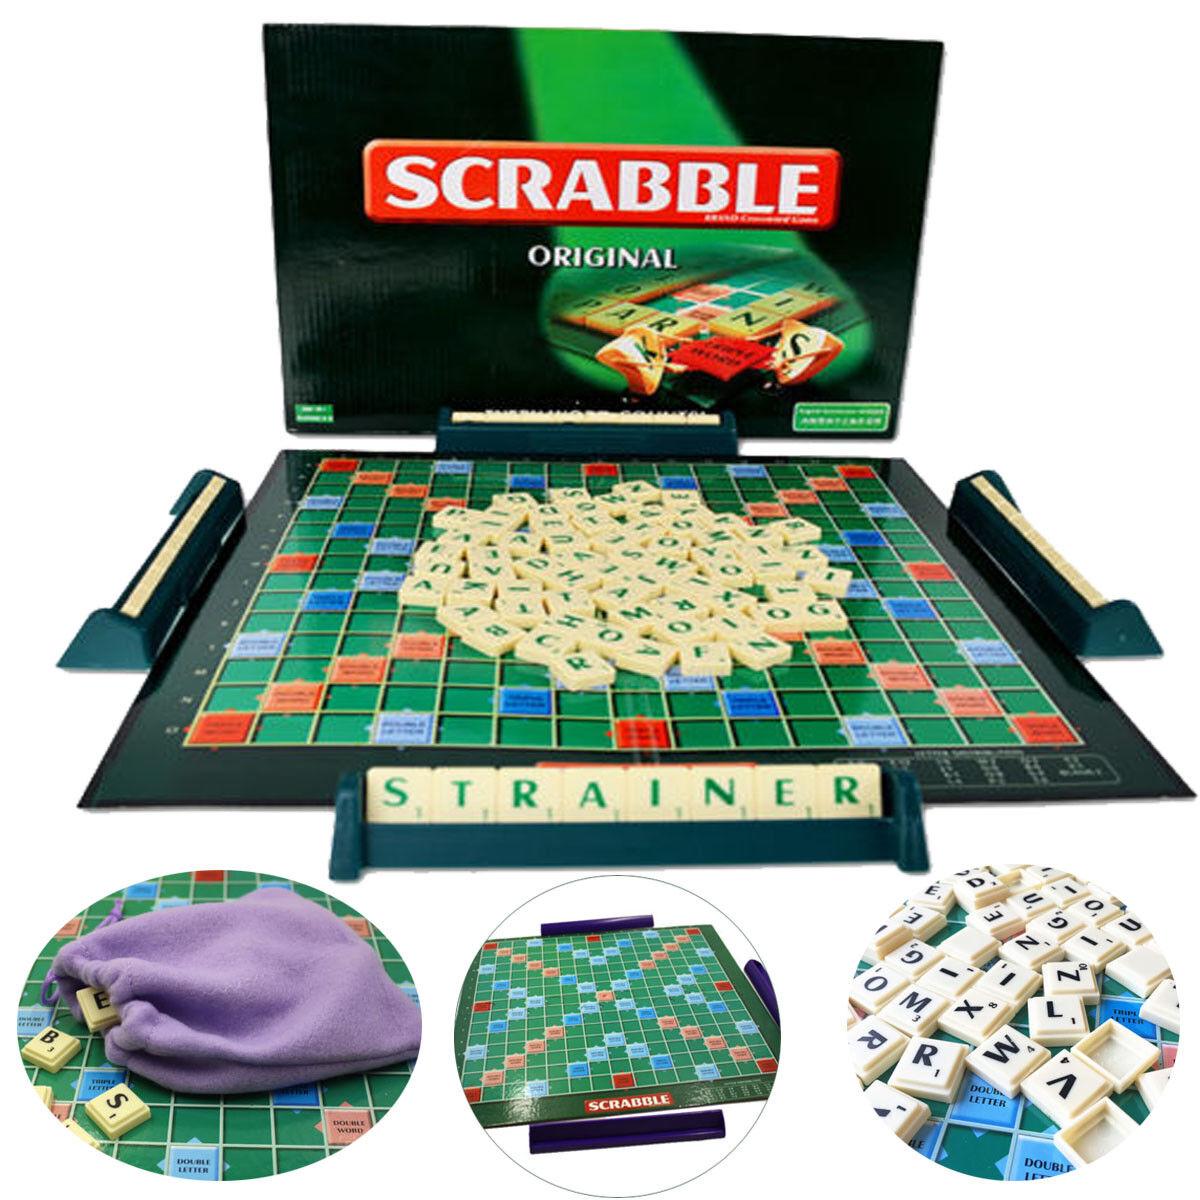 Mattel Spiele Original Scrabble Kompakt Legespiele Kinderspiele SPielzeug NEU